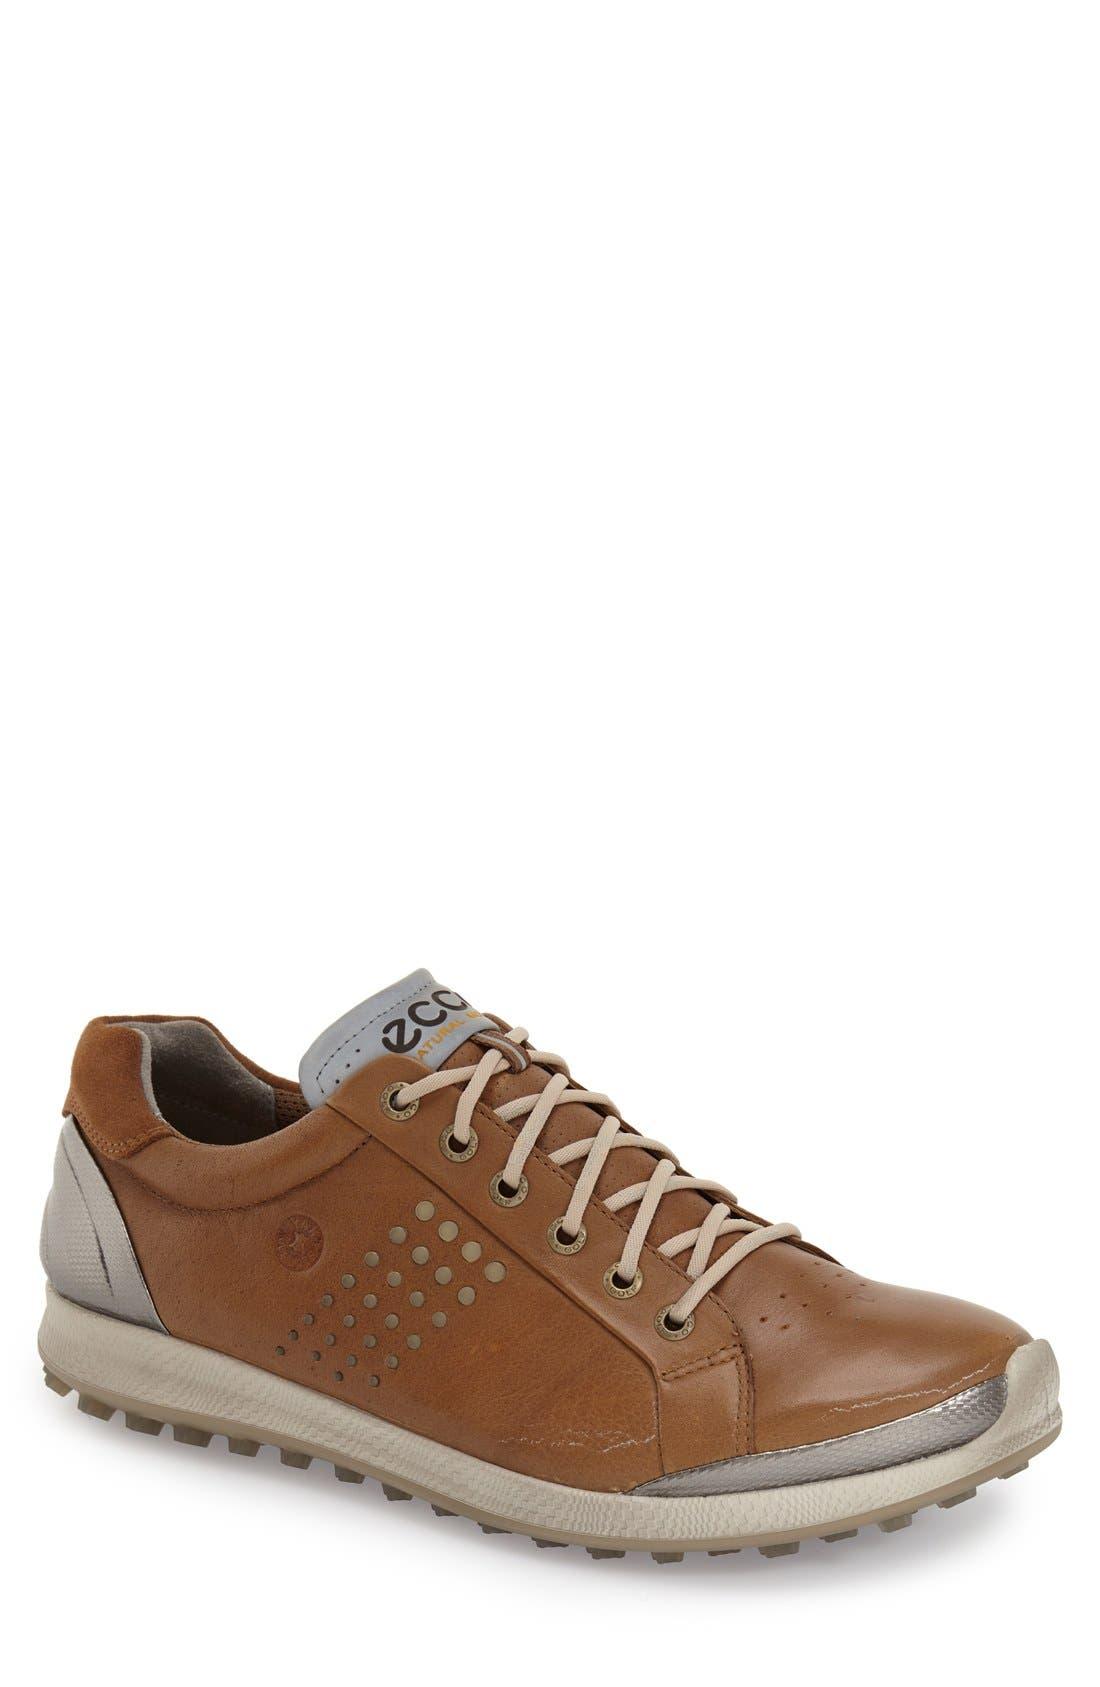 ECCO Biom Hybrid 2 Golf Shoe (Men)